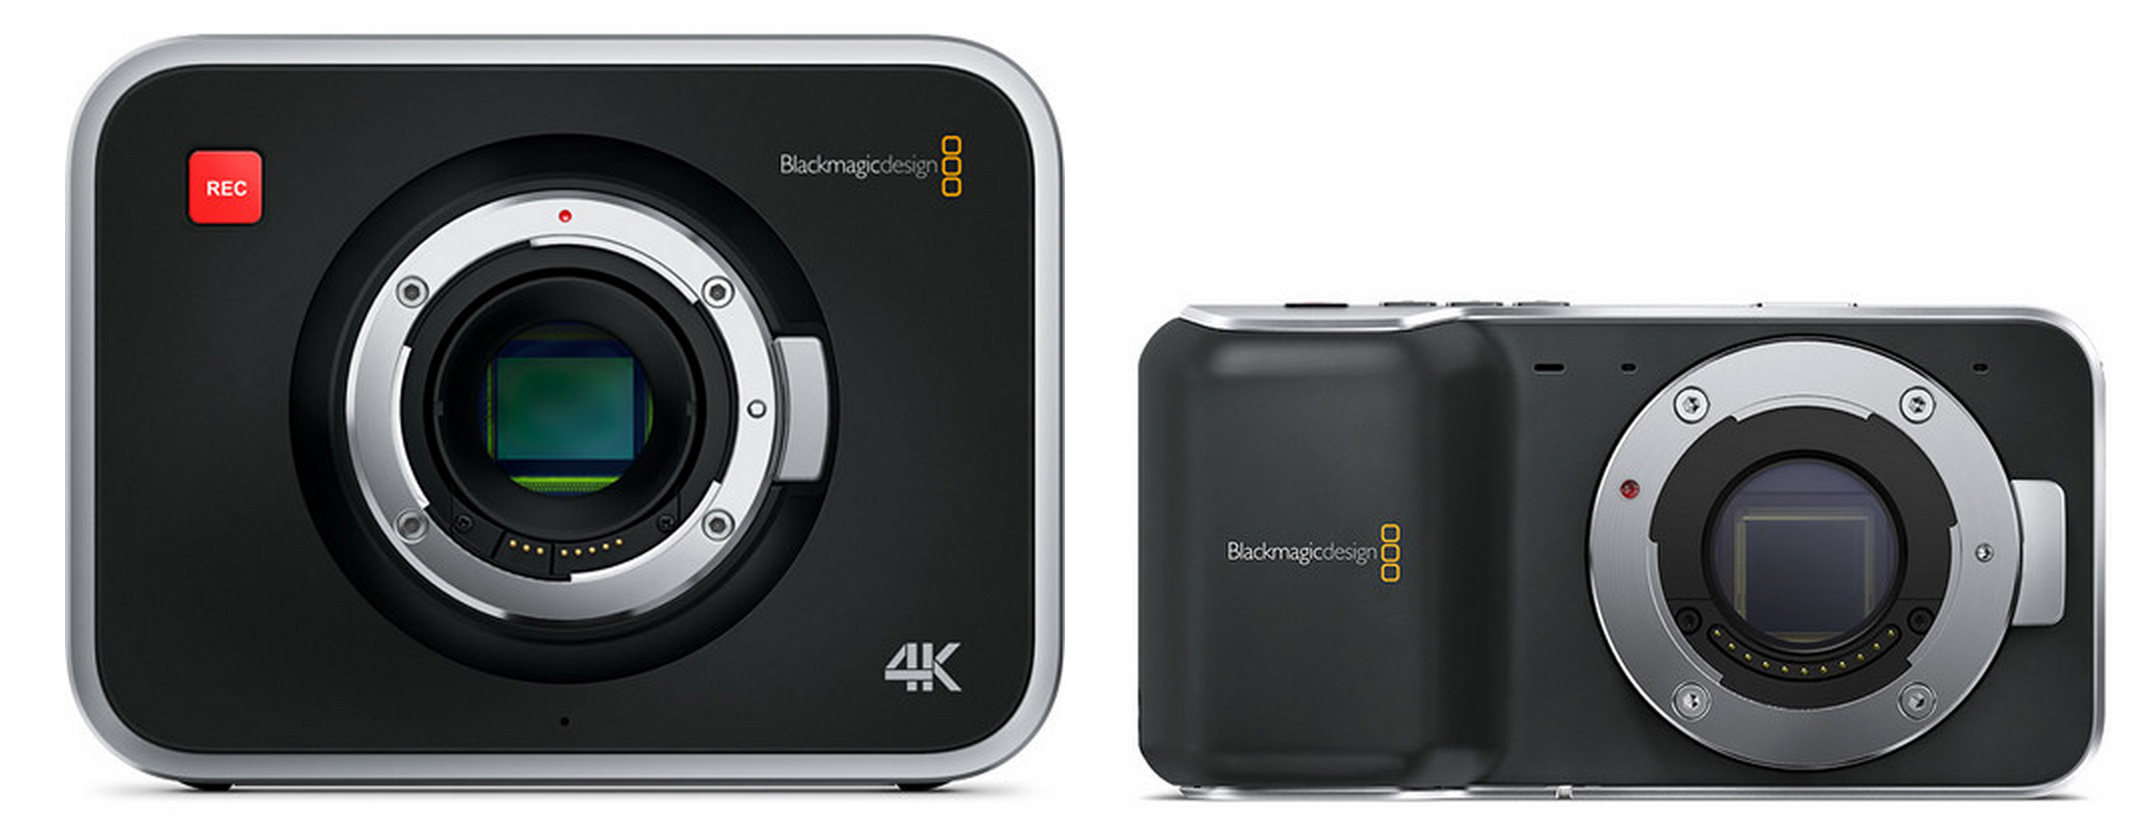 blackmagic 4k and pocket cinema cameras